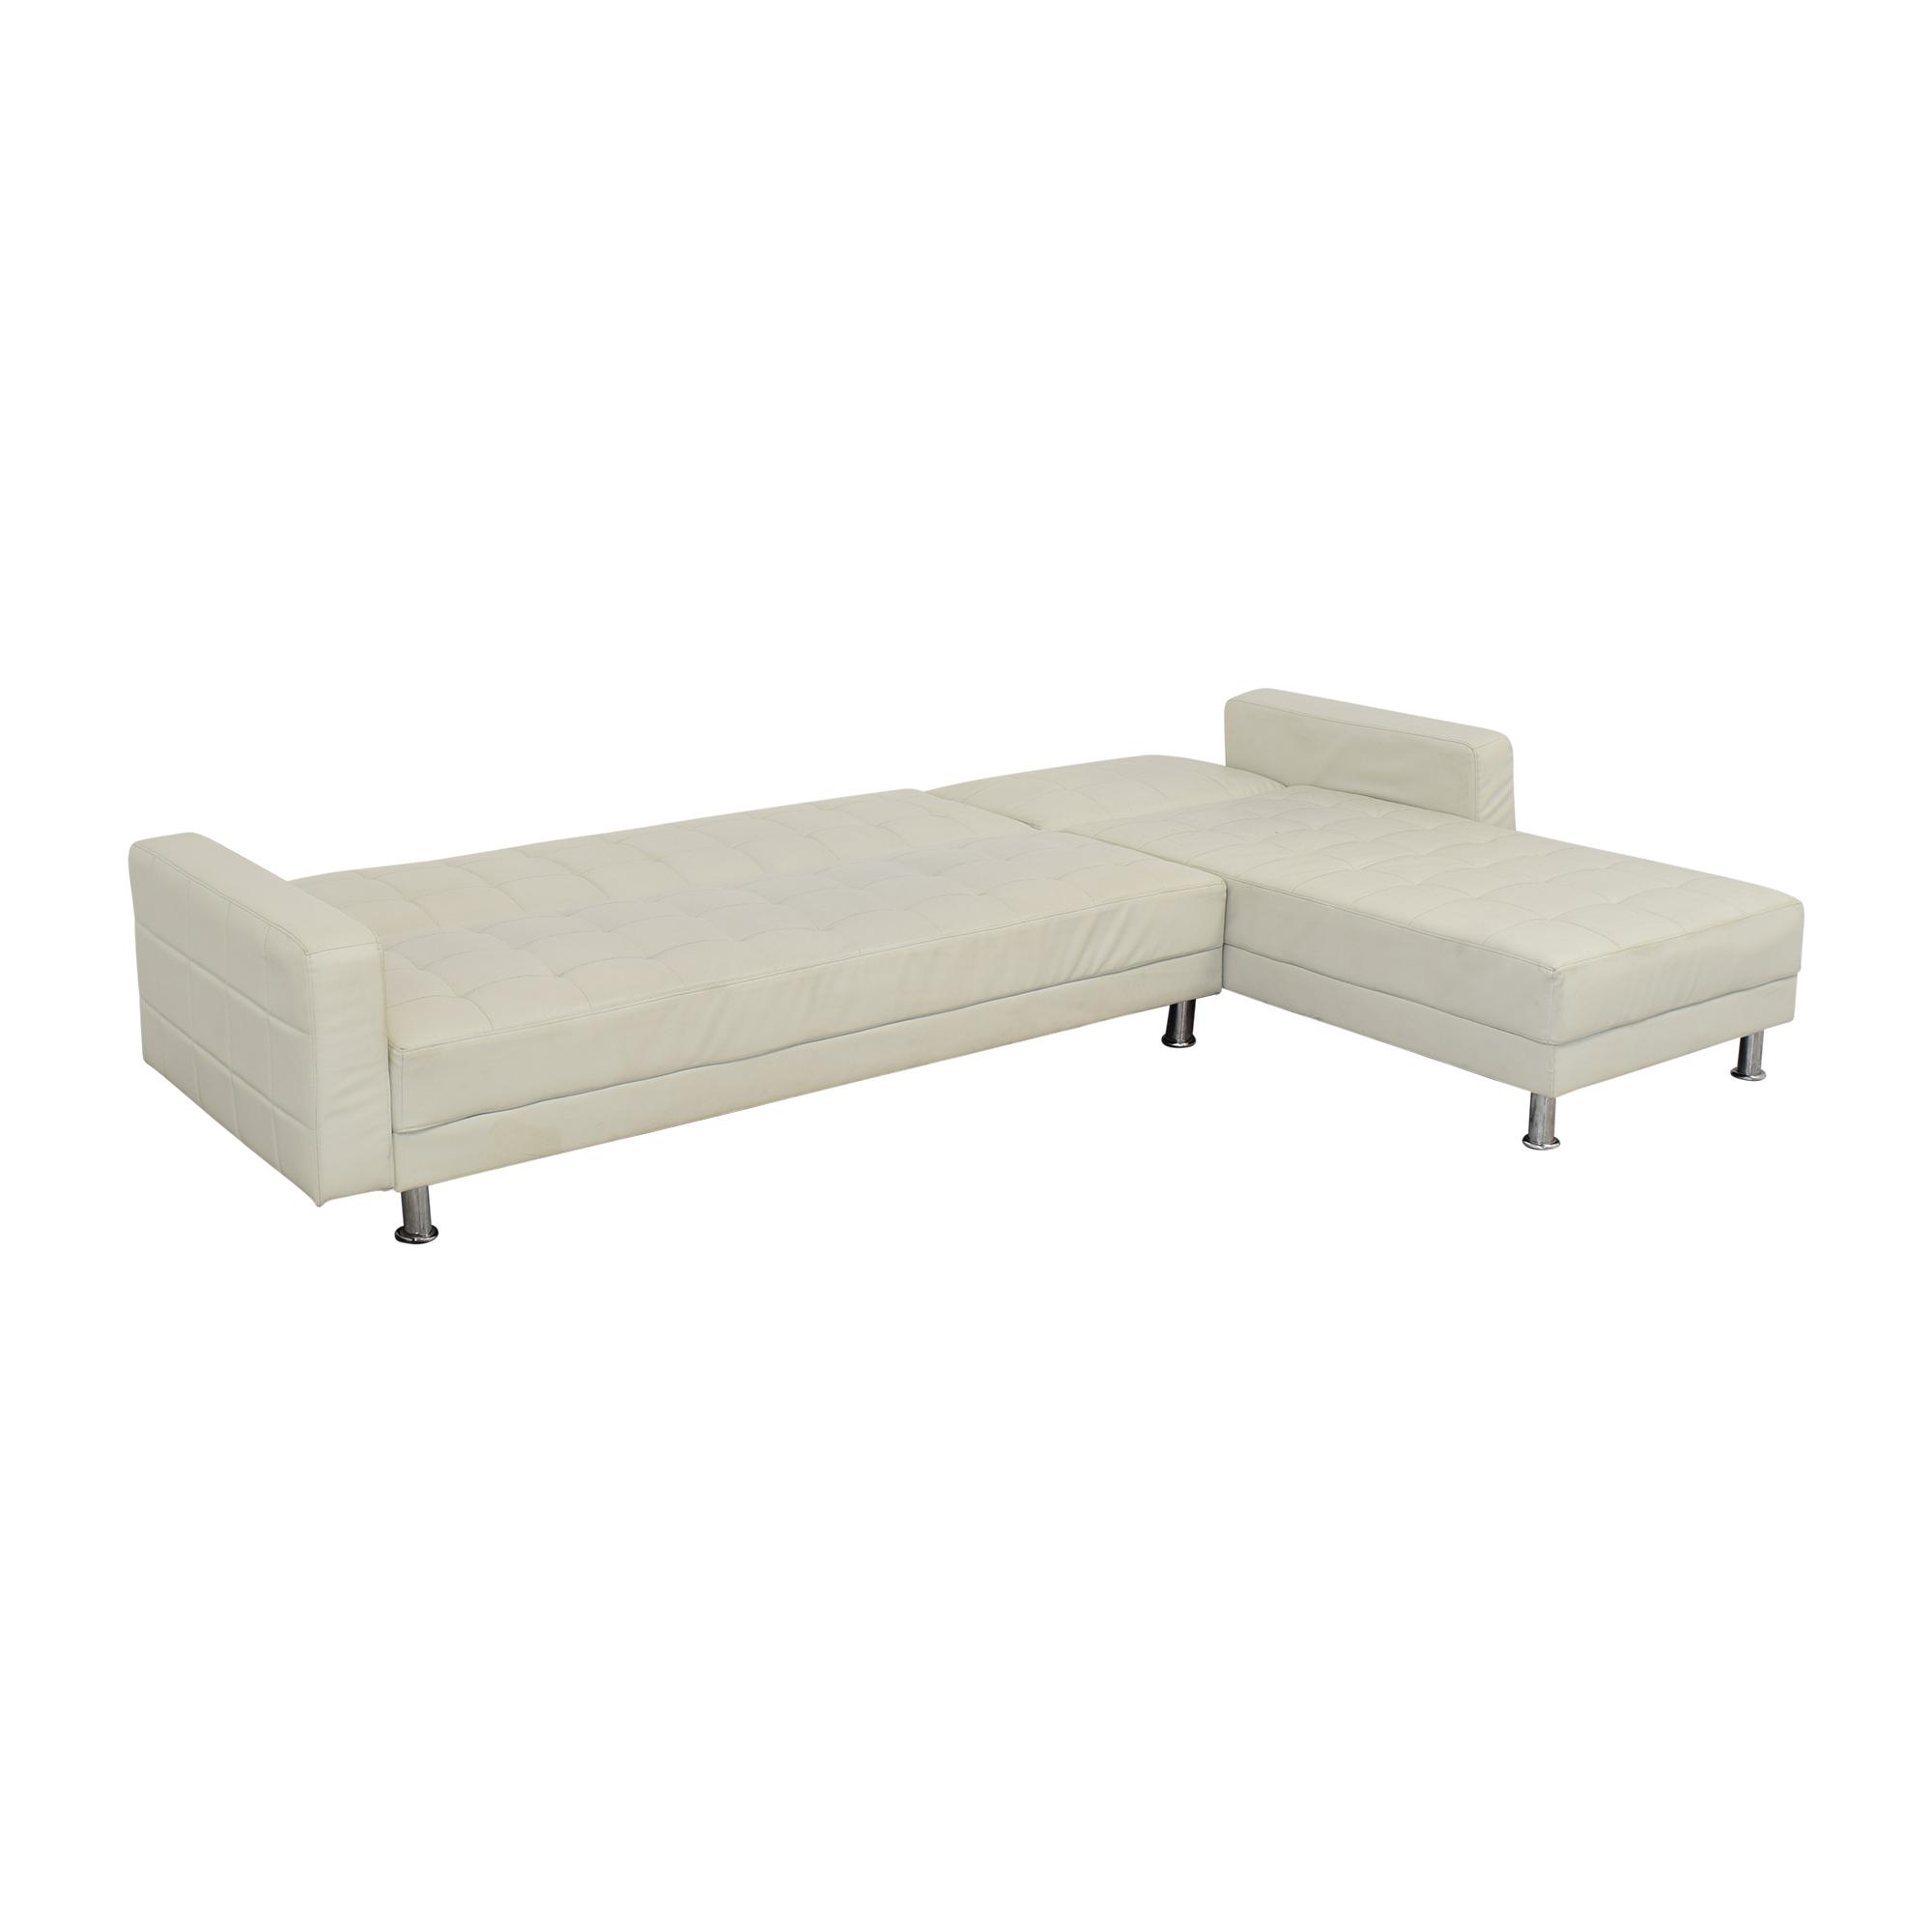 Wayfair Spirit Lake Sleeper Sectional Sofa sale